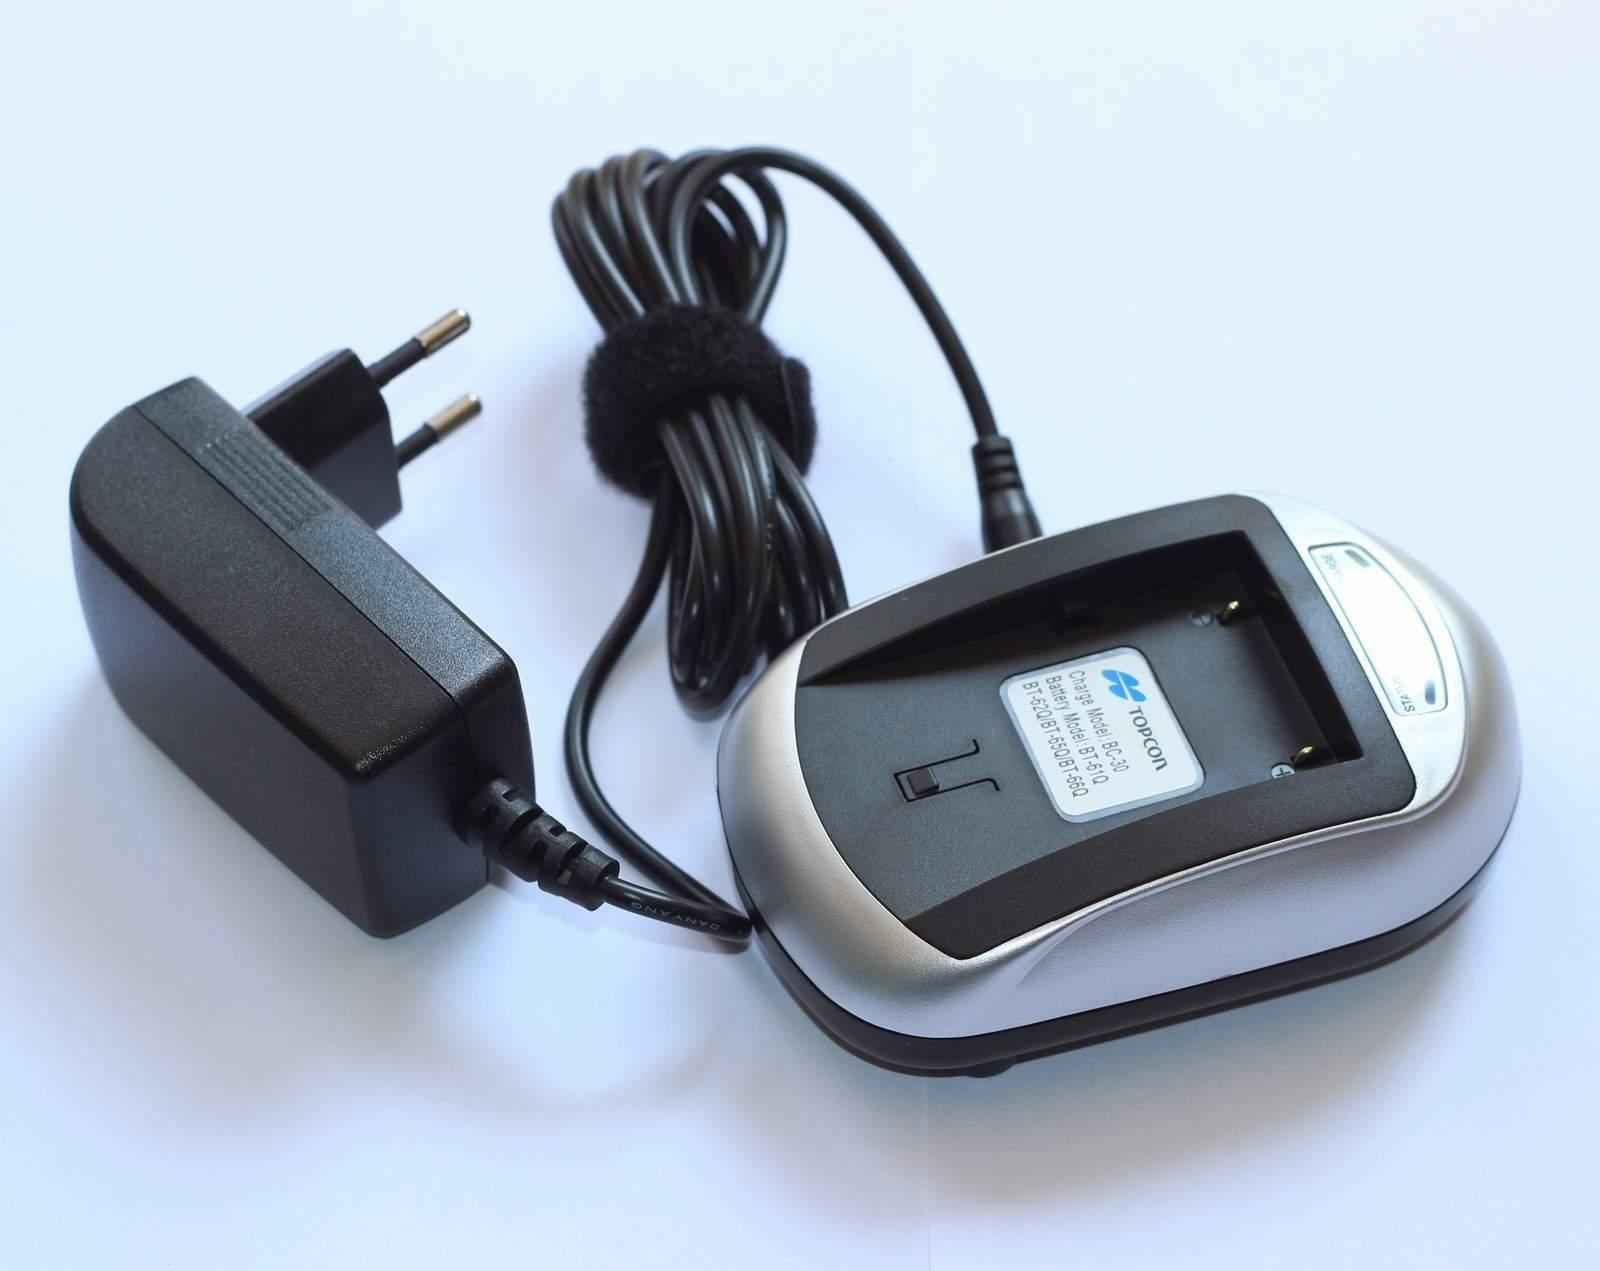 Kompatibel batterie ladegerät BC-30 für Topcon BT-61/BT-65Q/BT66Q batterie